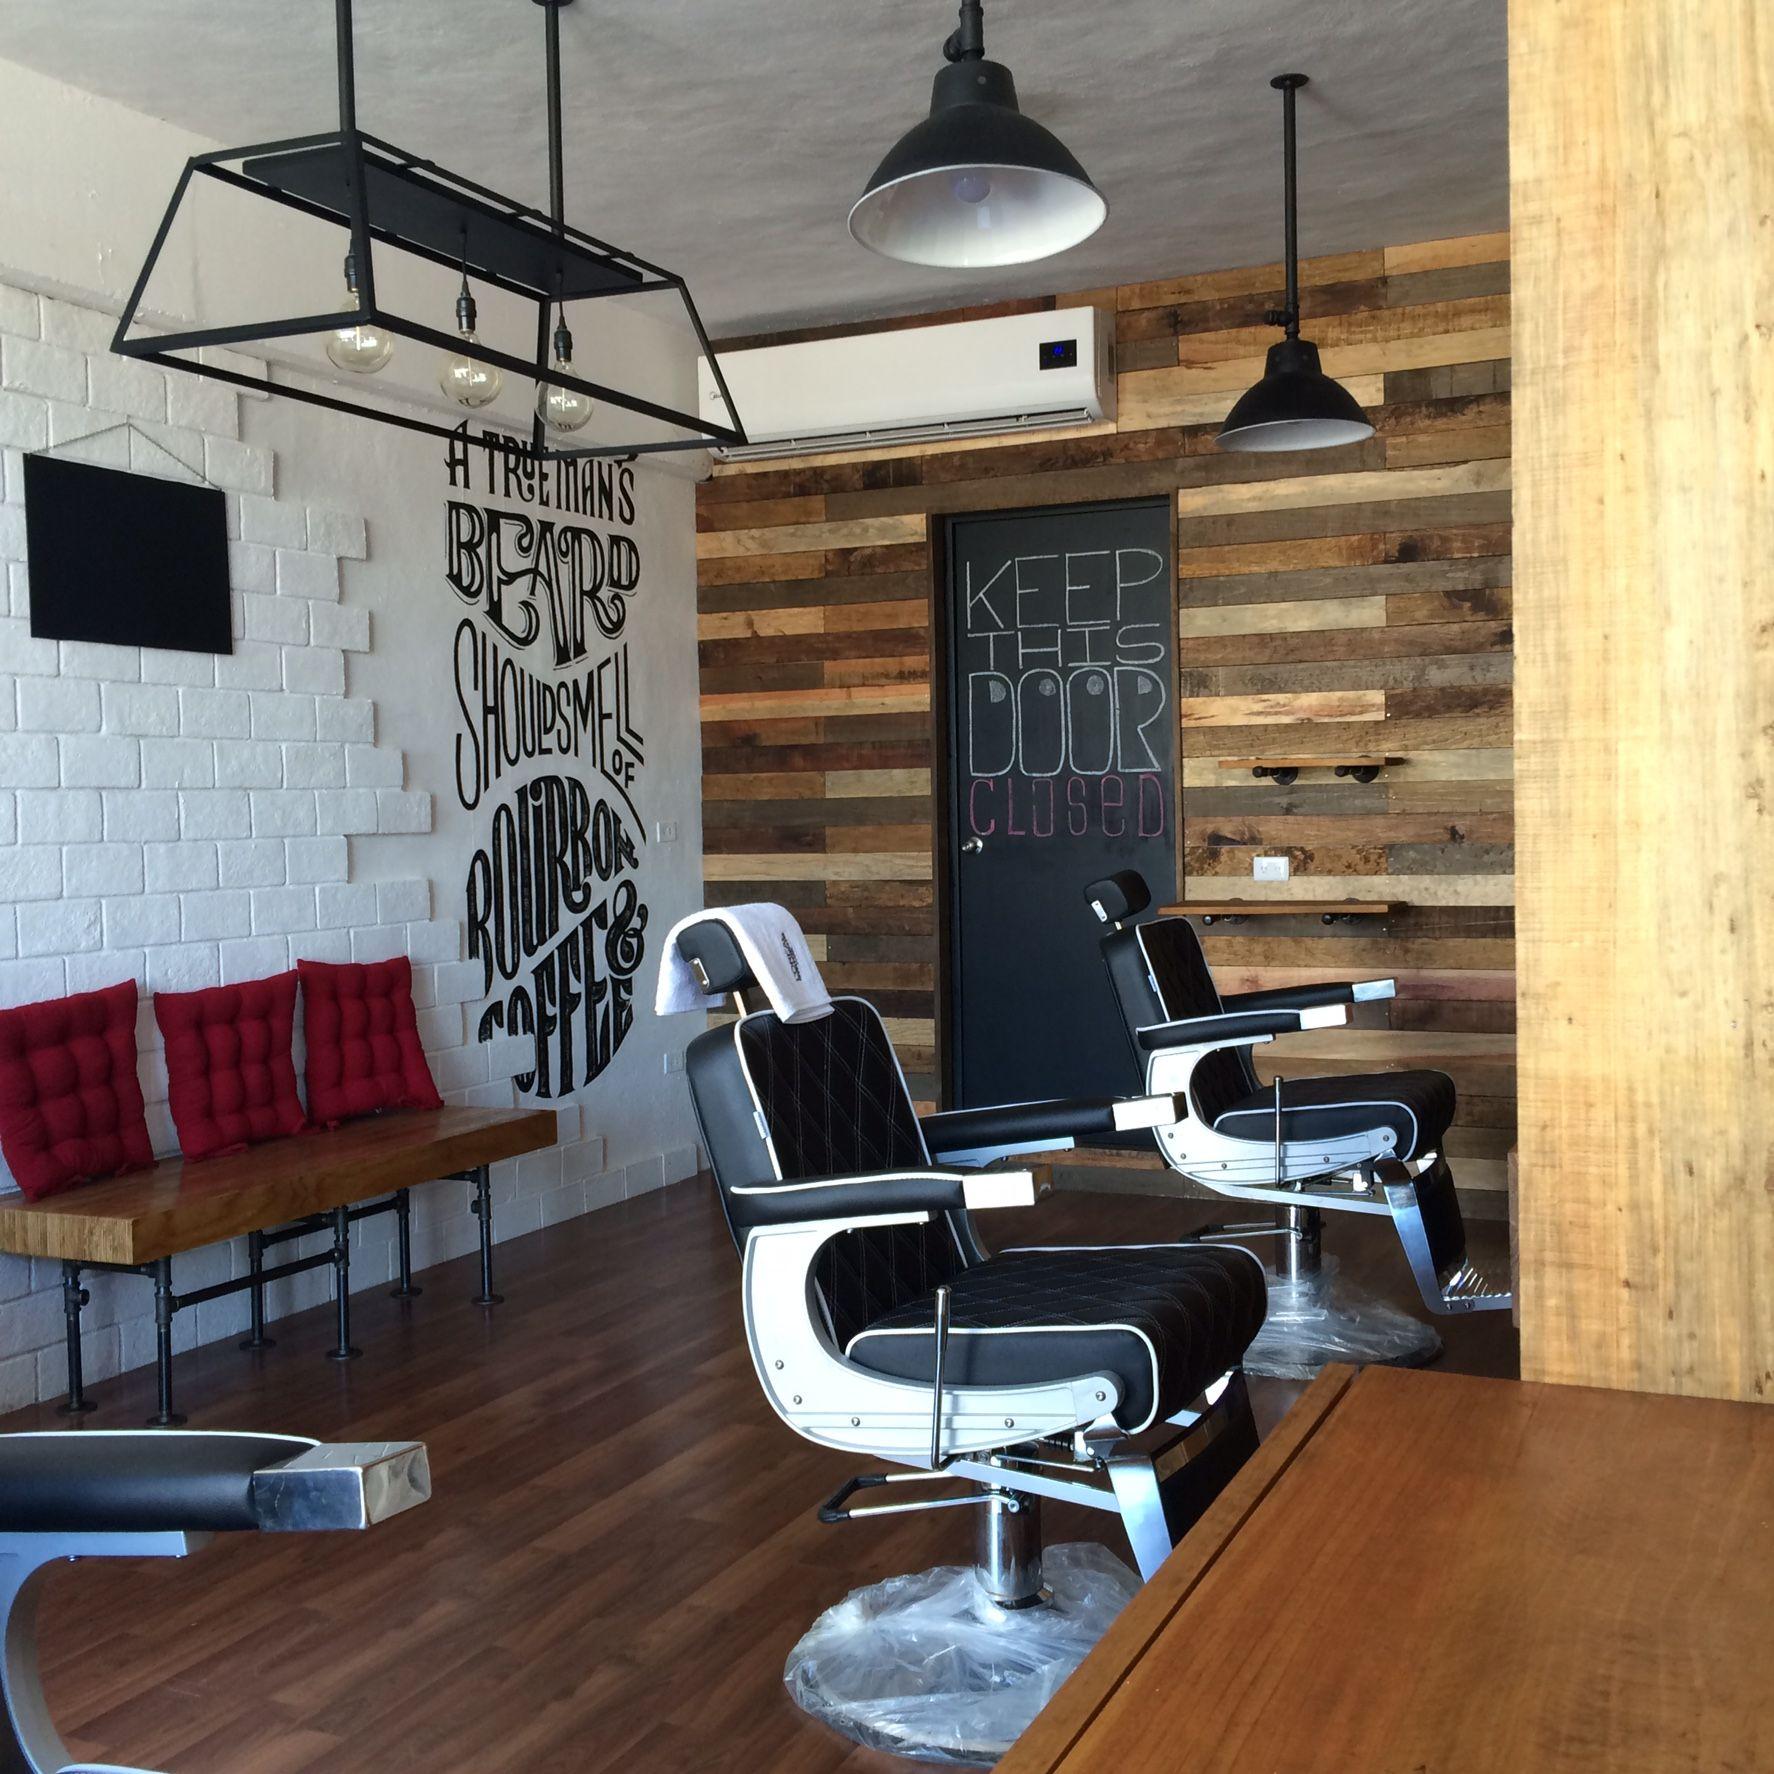 The legend barbershop en m rida yucat n dise o de - Salon diseno ...